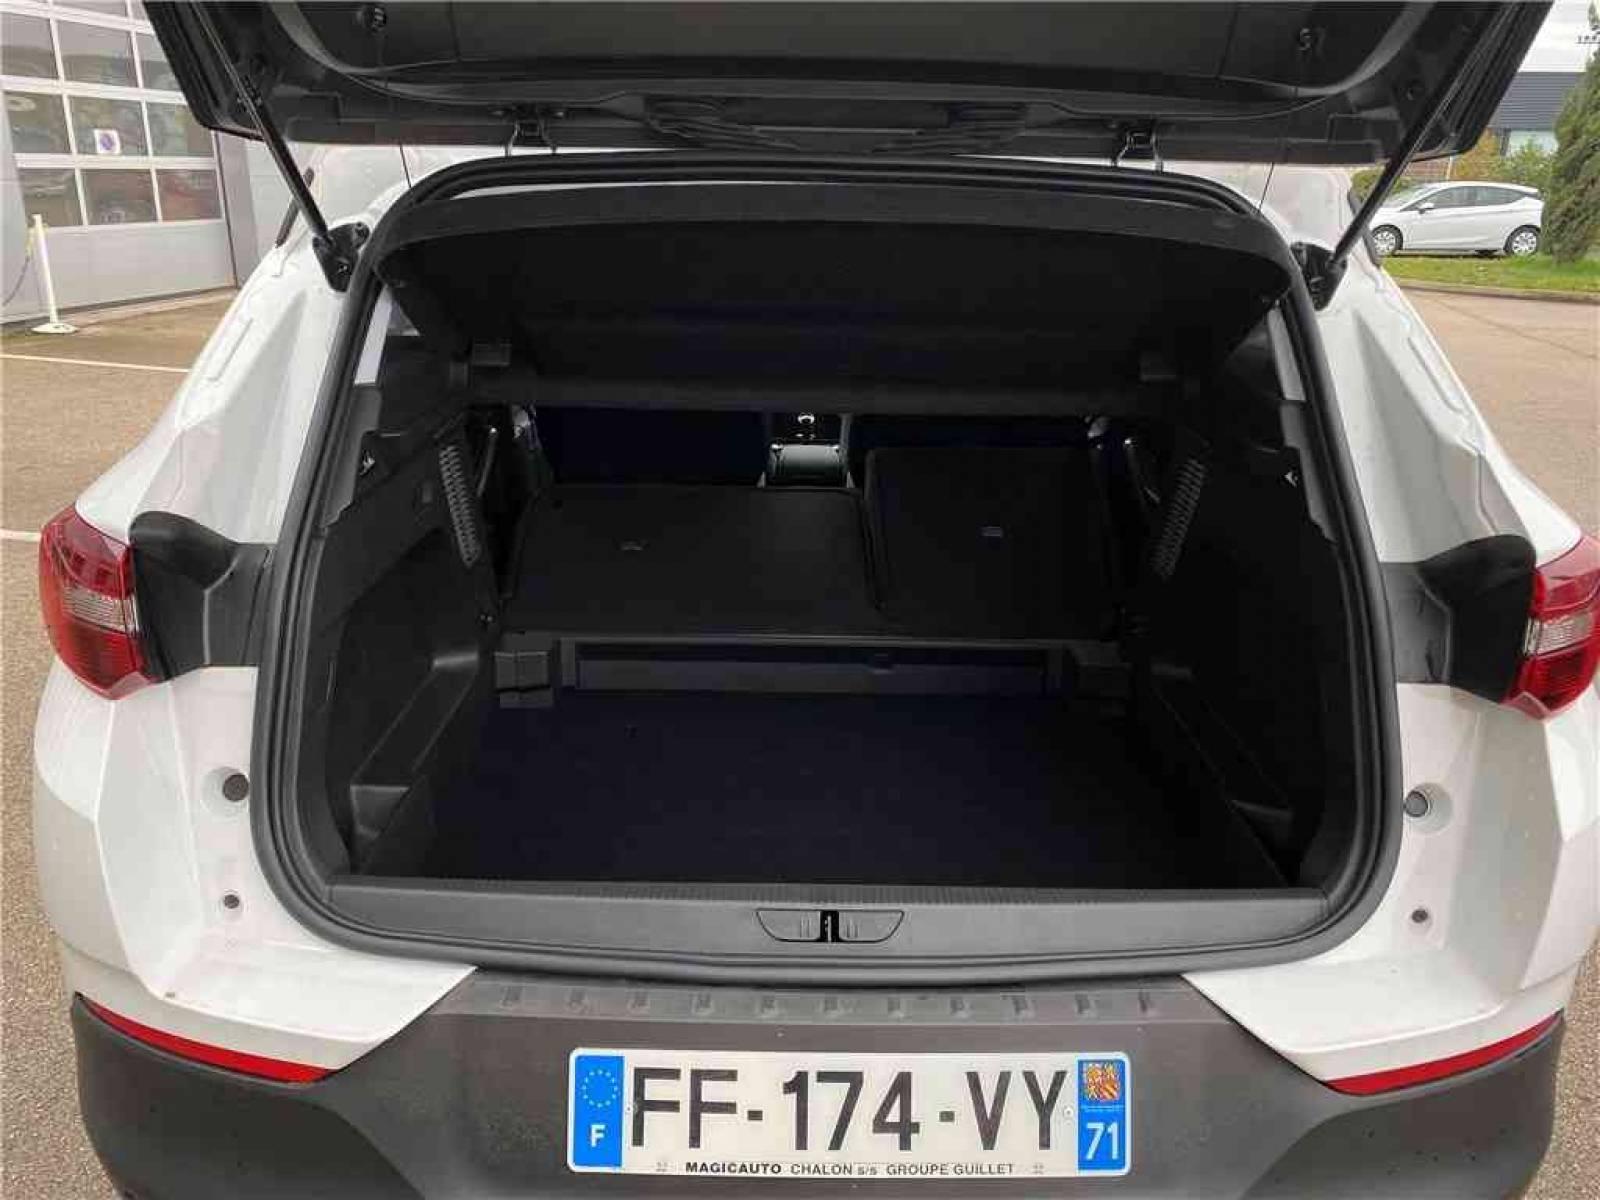 OPEL Grandland X 1.2 Turbo 130 ch - véhicule d'occasion - Groupe Guillet - Opel Magicauto - Chalon-sur-Saône - 71380 - Saint-Marcel - 24